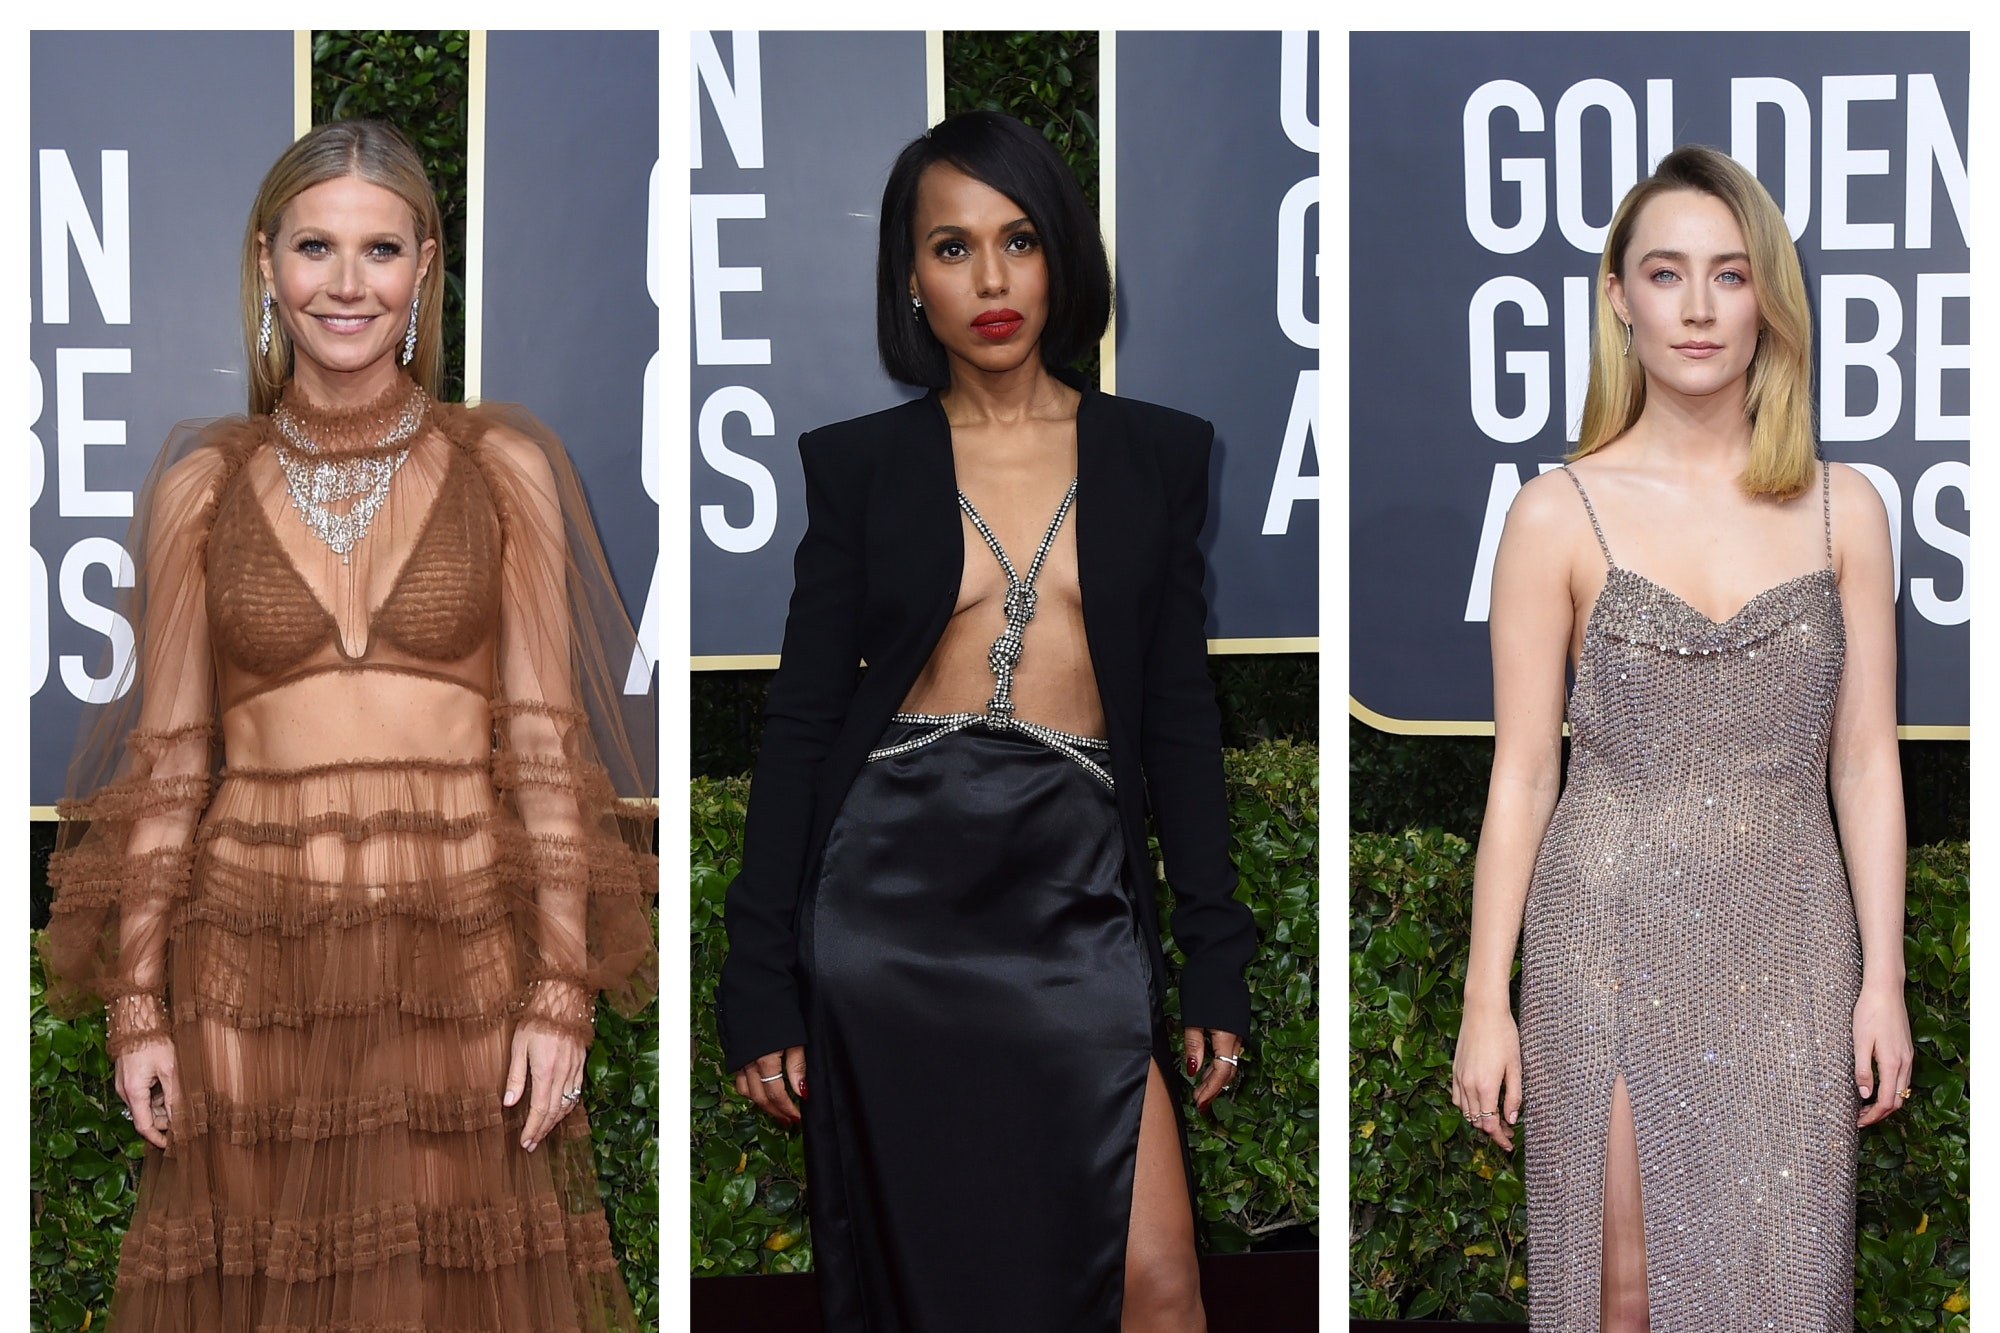 flesh on Golden Globes red carpet